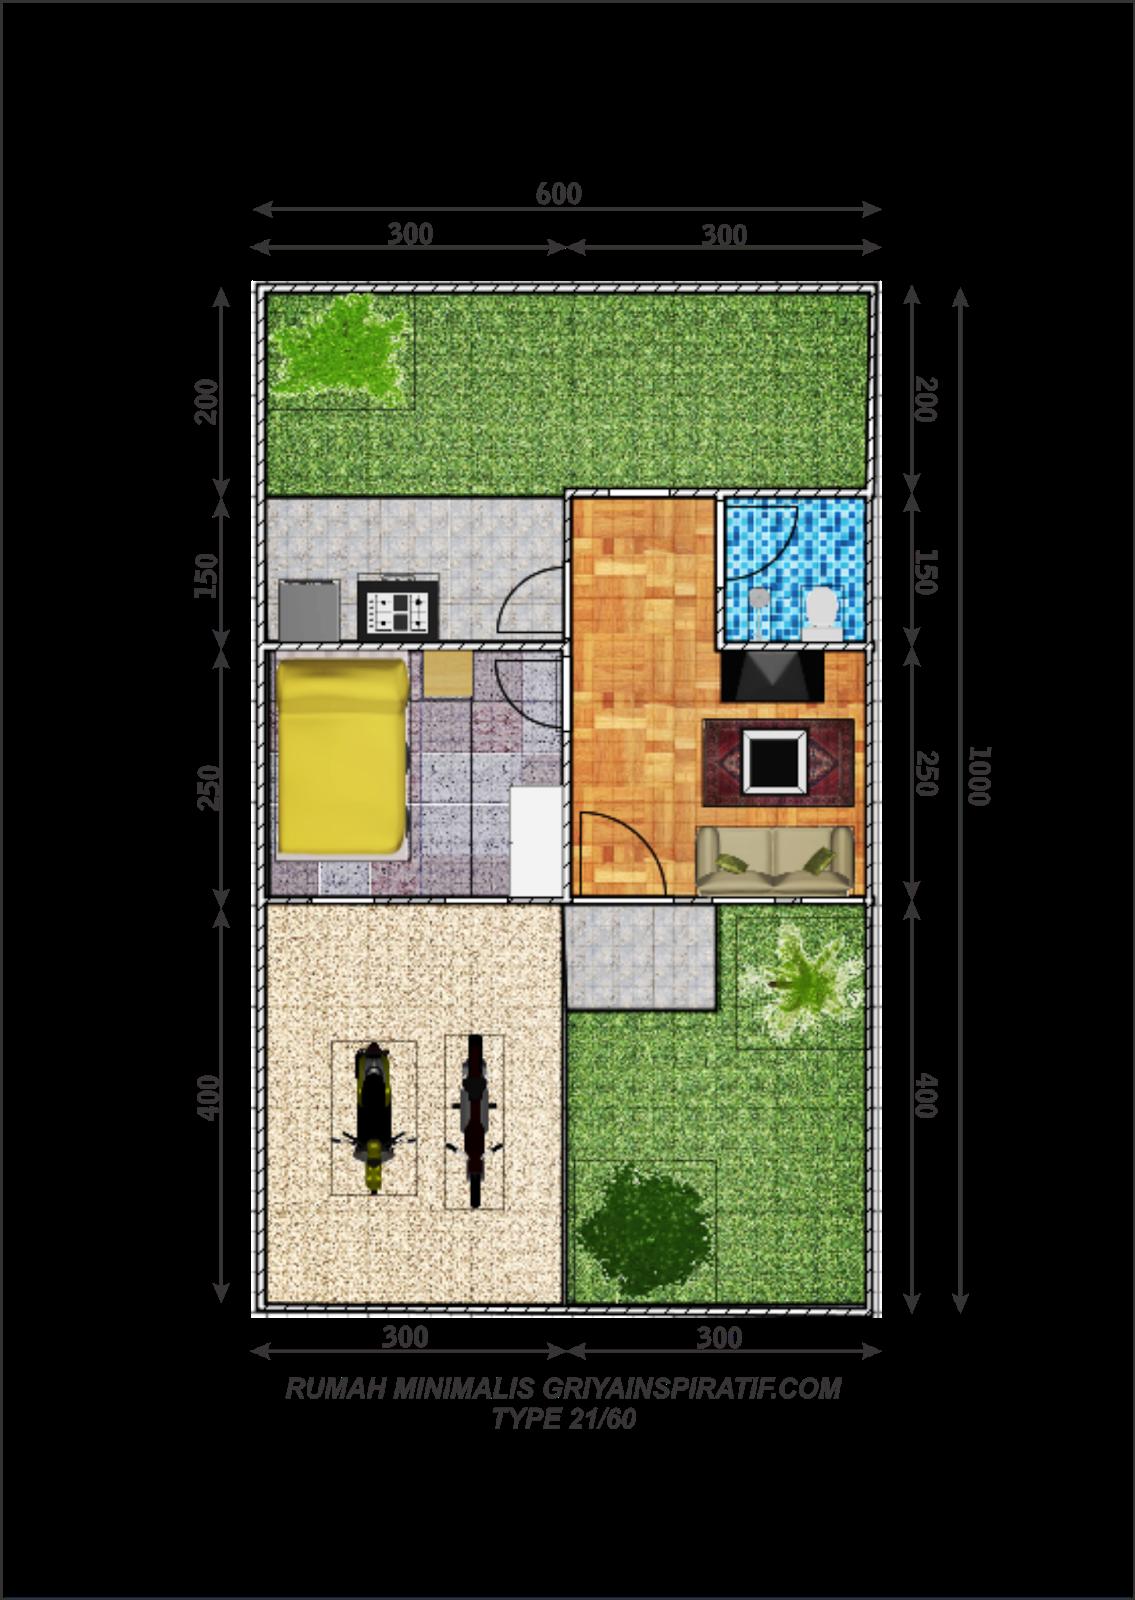 Interior Rumah Minimalis Sederhana Type 21 Dshdesign4kinfo